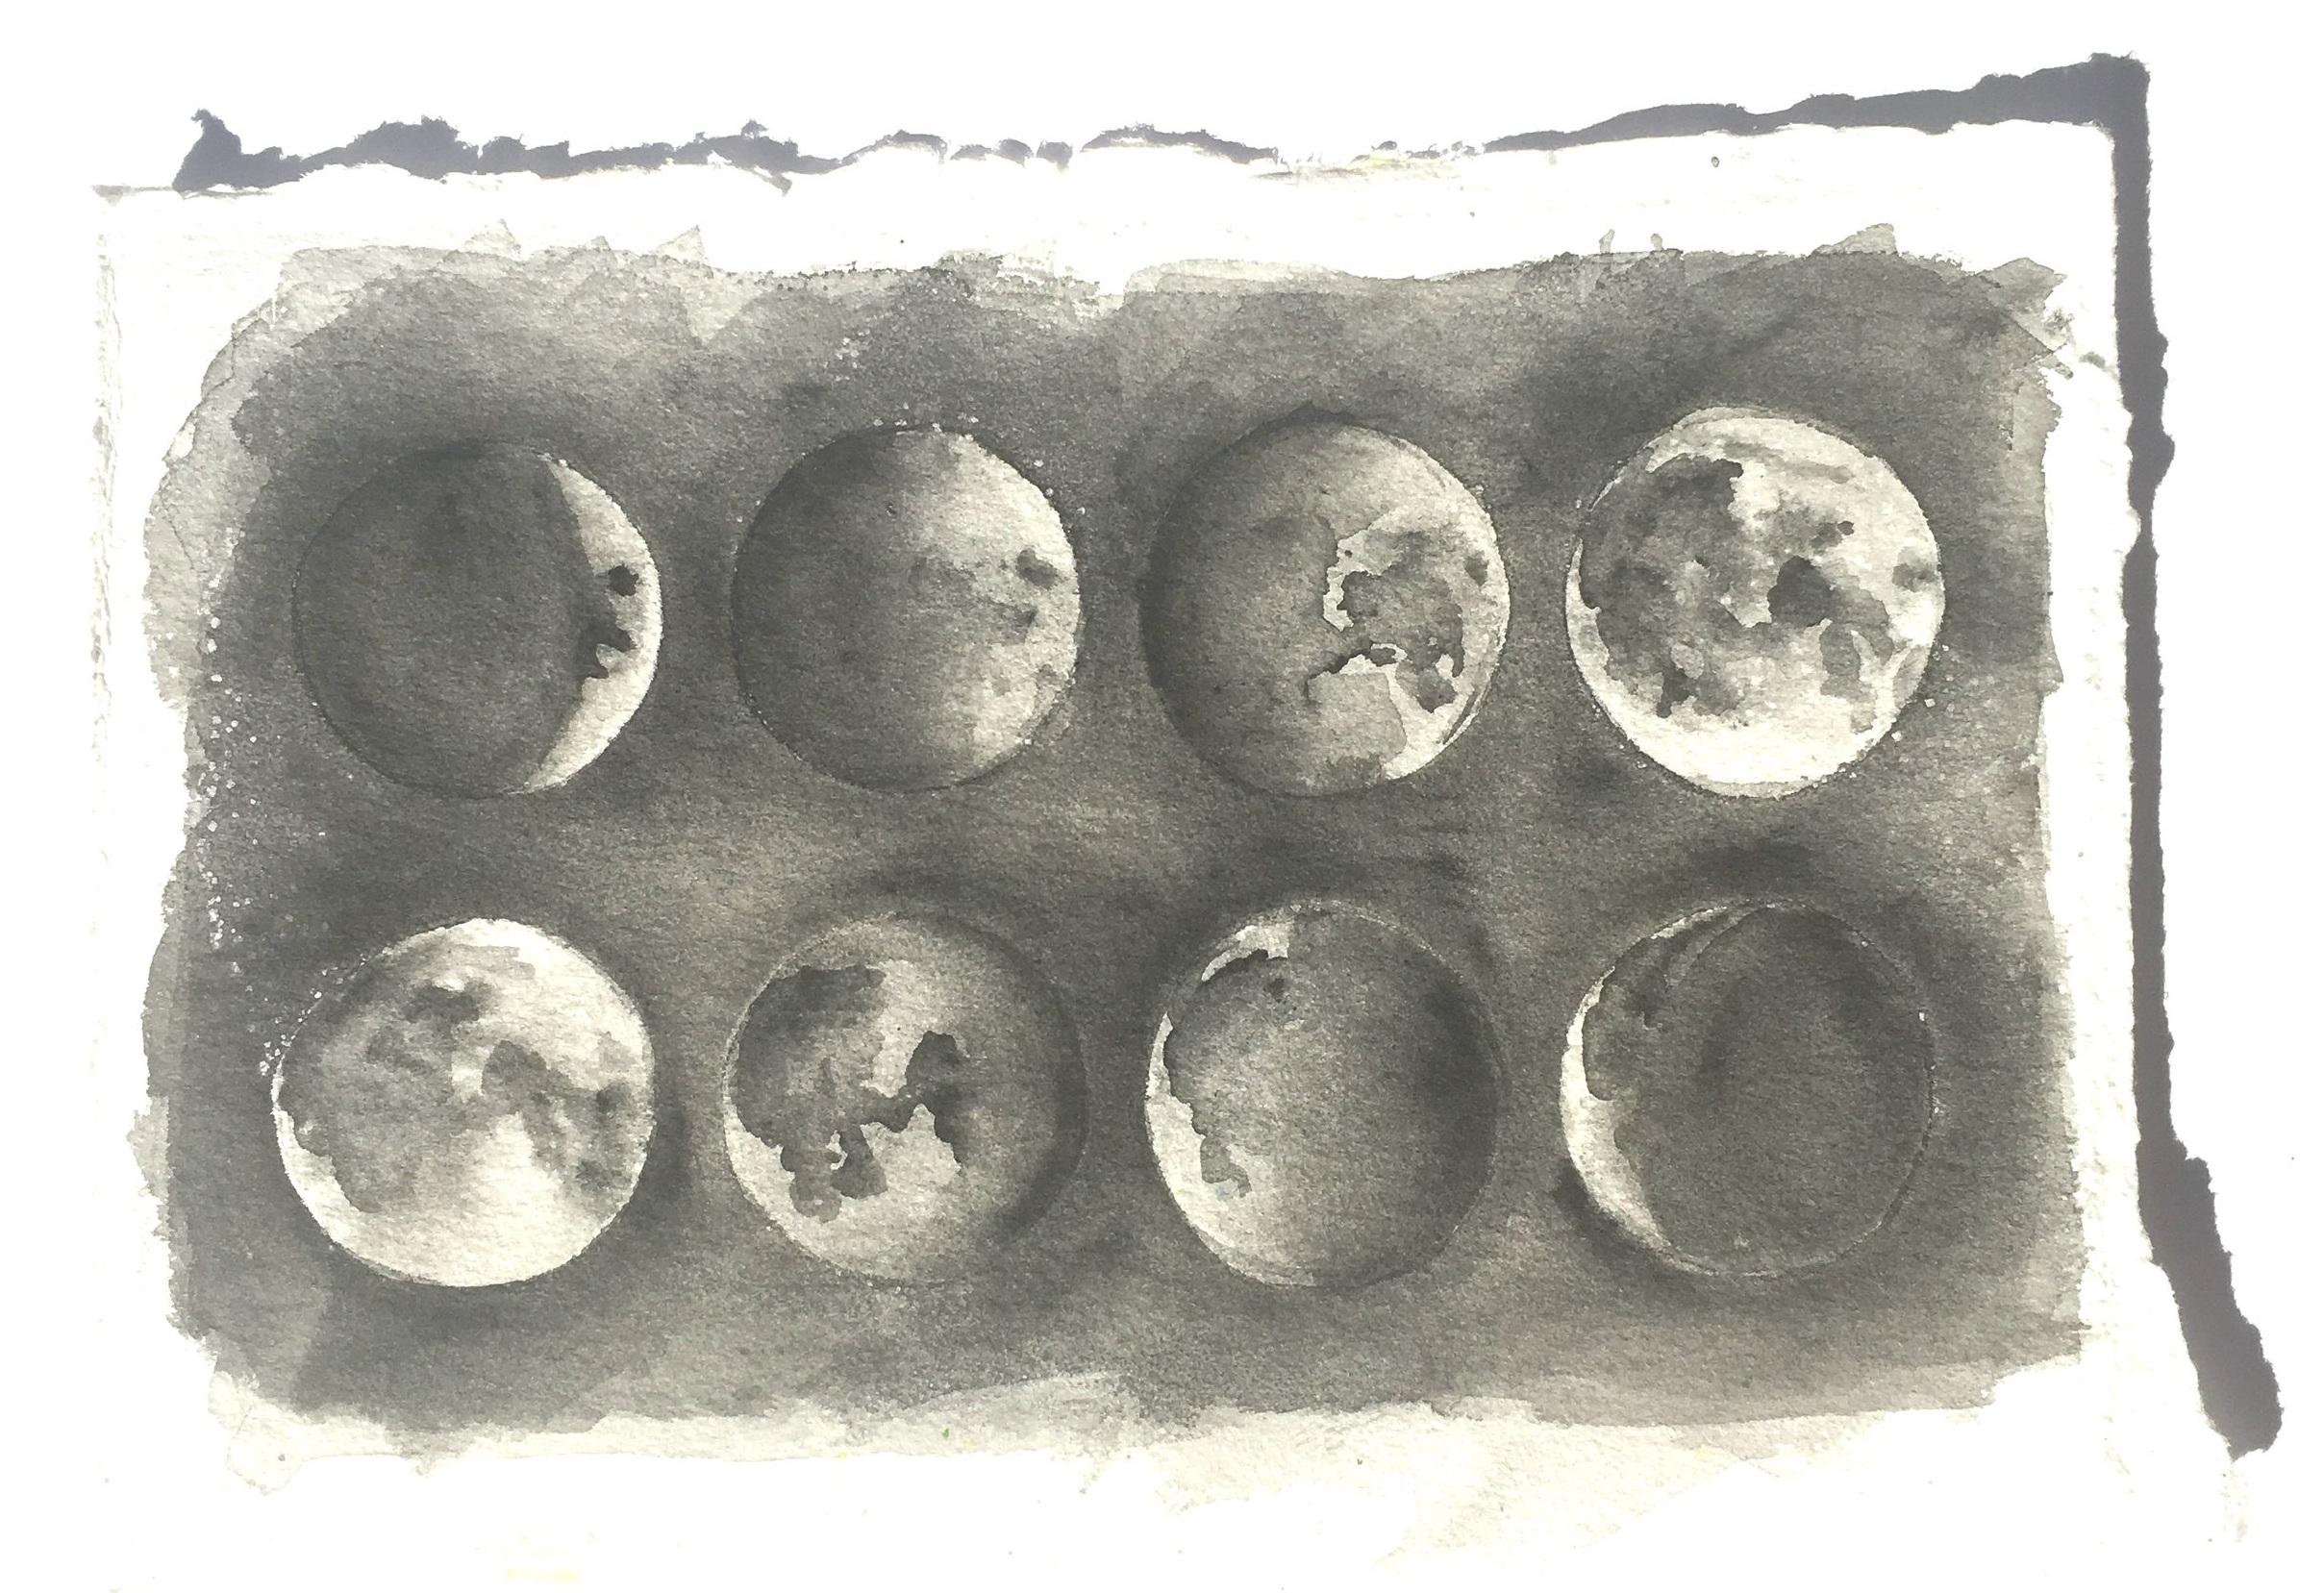 Moon+phases.jpg